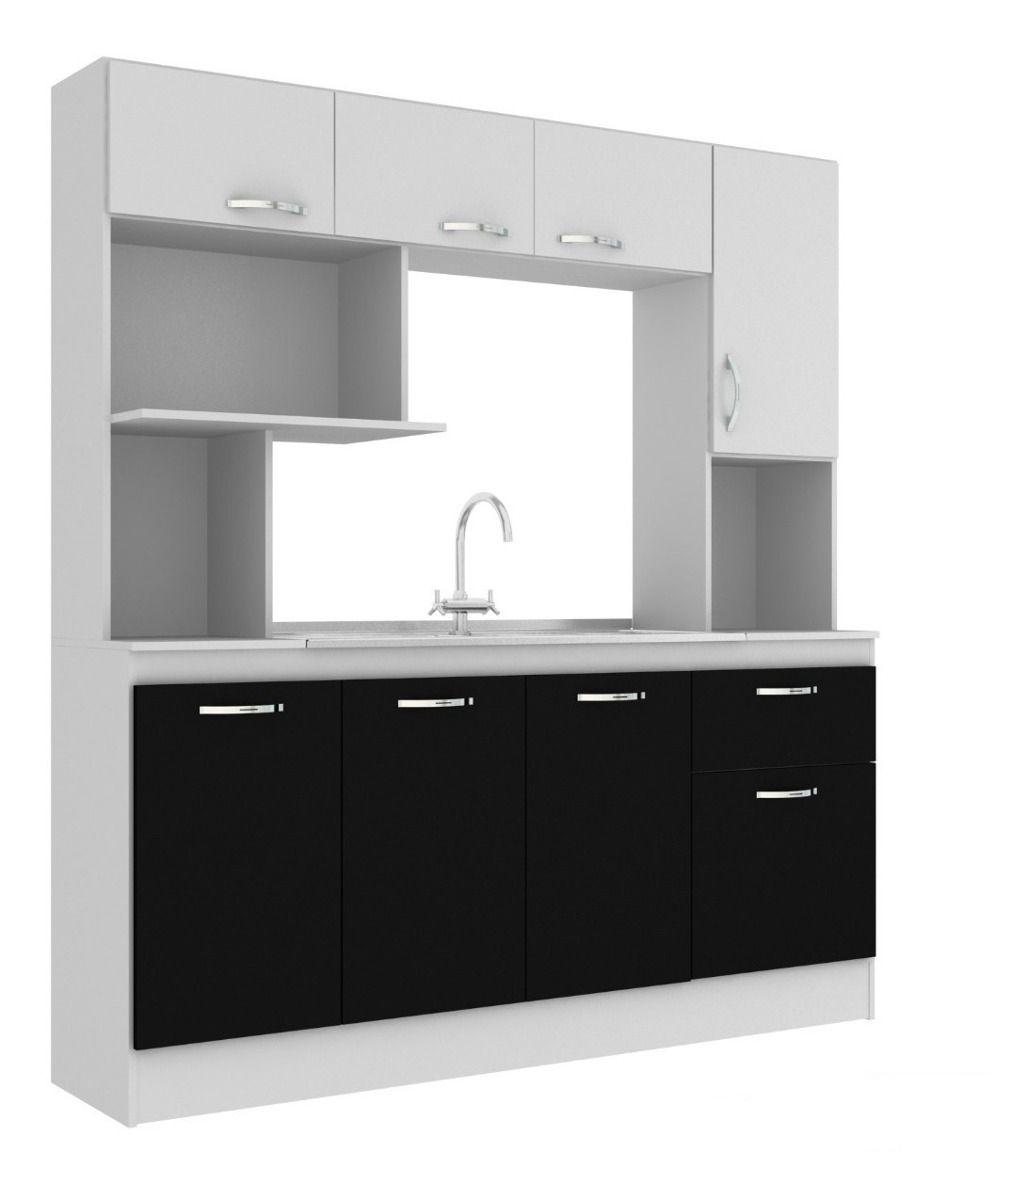 Mueble Kit Cocina Compacta Napoles + Pileta Acero Inoxidabl